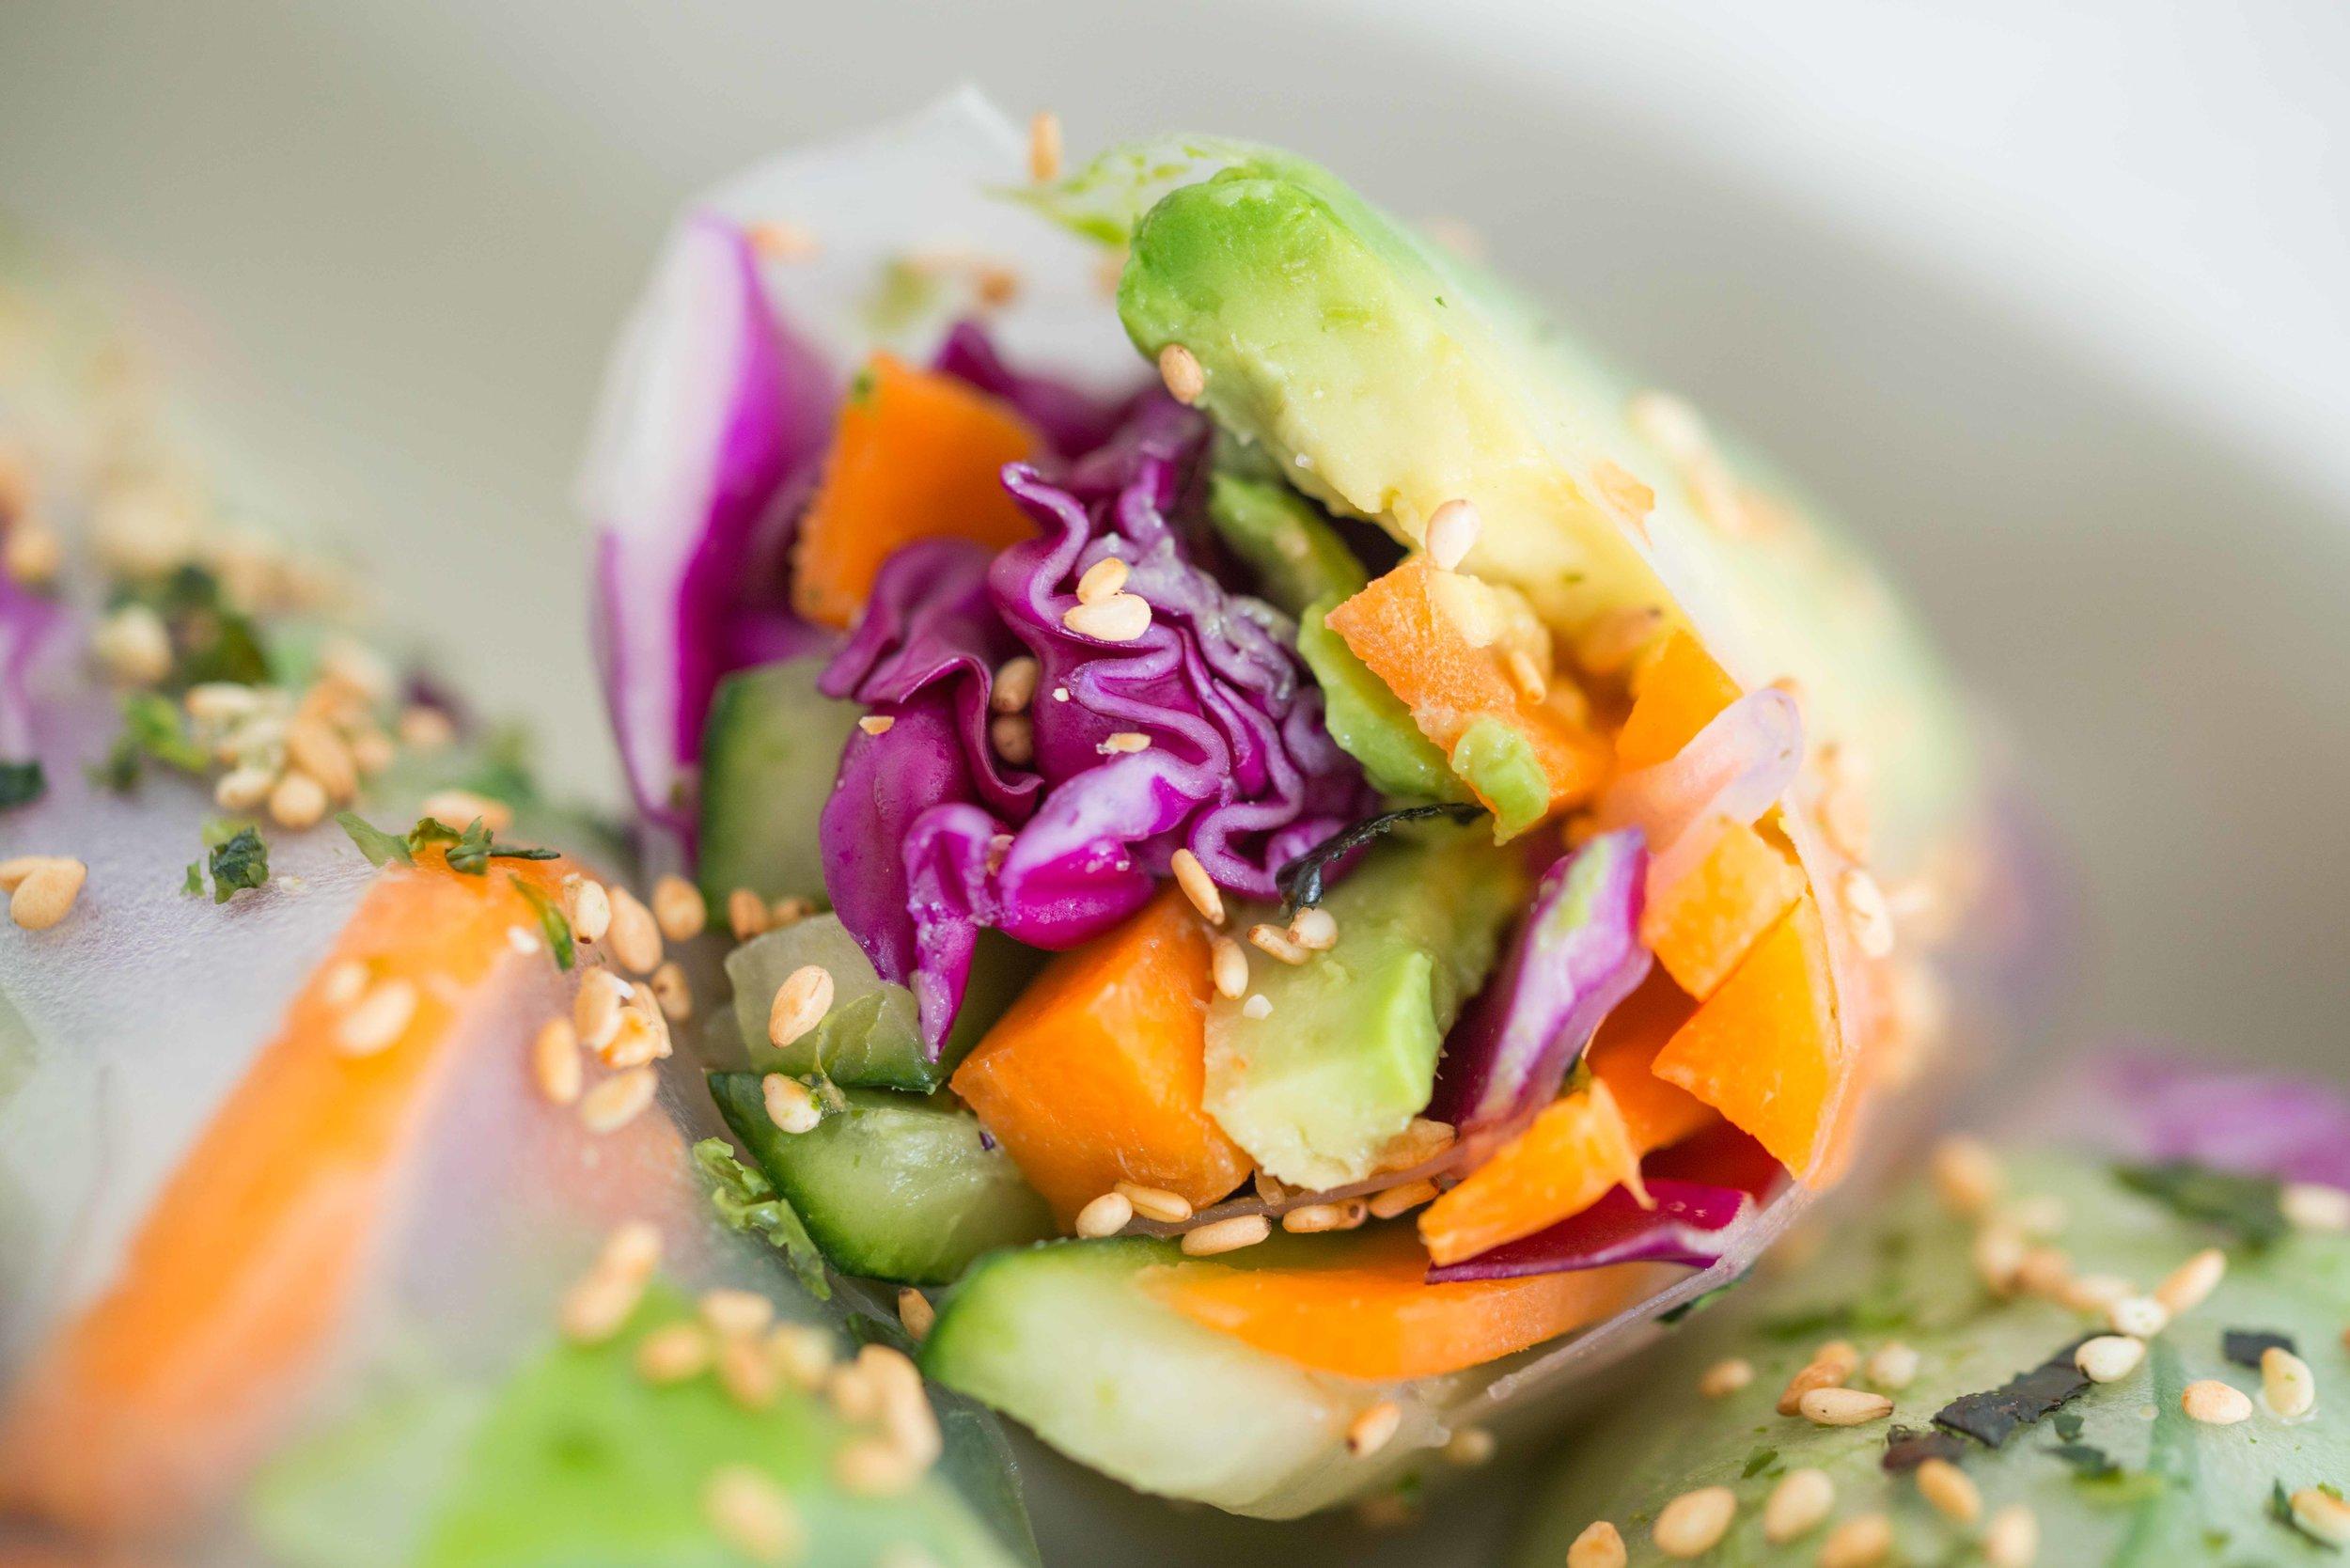 DSC_6448_Riley_Yahr_Vegetable_Spring_Rolls_Peanut_Sauce.jpg